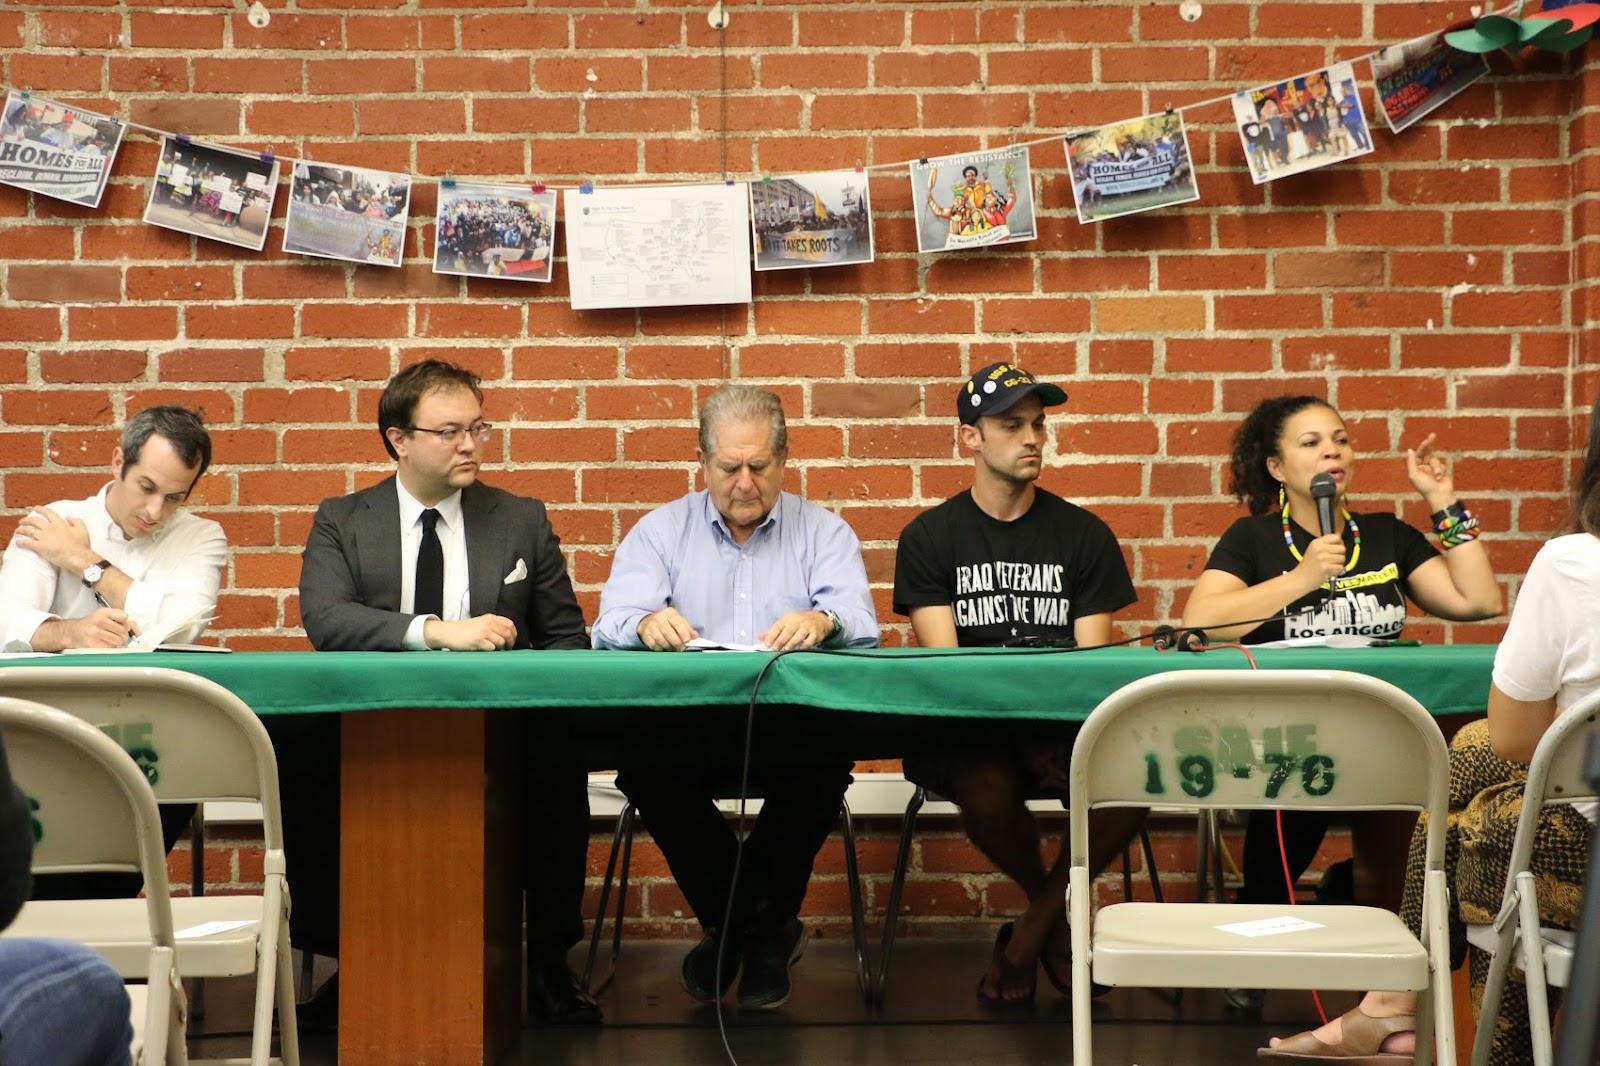 Left to right: David Stein (UCLA), Ace Katana (Ground Game LA), Michael Novick (Anti-Racist Action), John Motter (DSA-LA, Iraq Veterans Against the War), Melina Abdullah (Black Lives Matter LA)